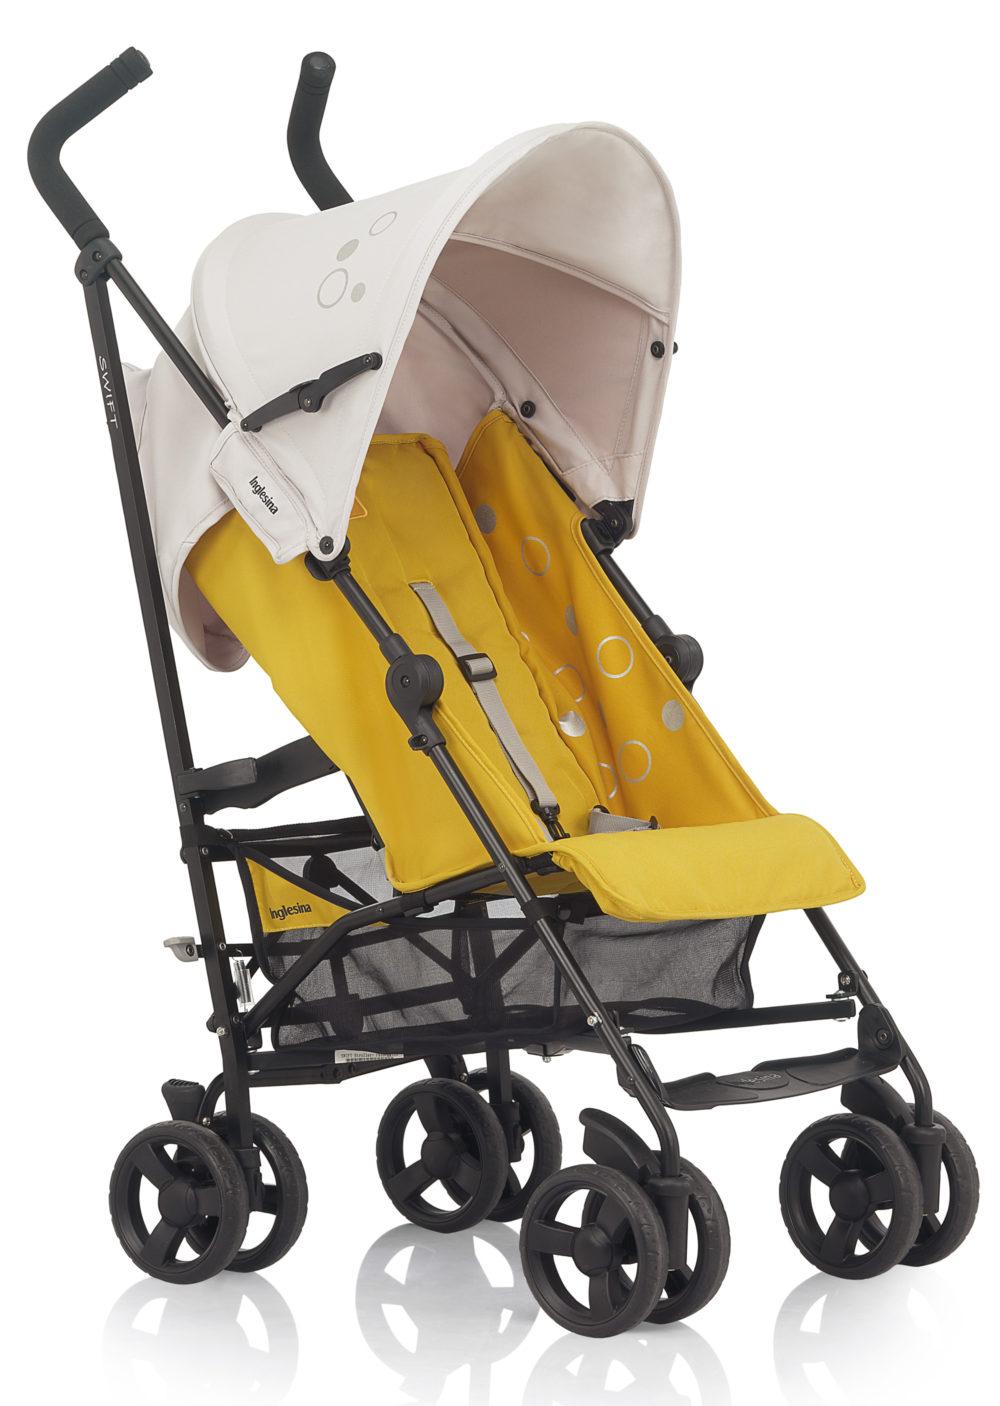 Детская коляска Inglesina Swift с бампером (желтый)